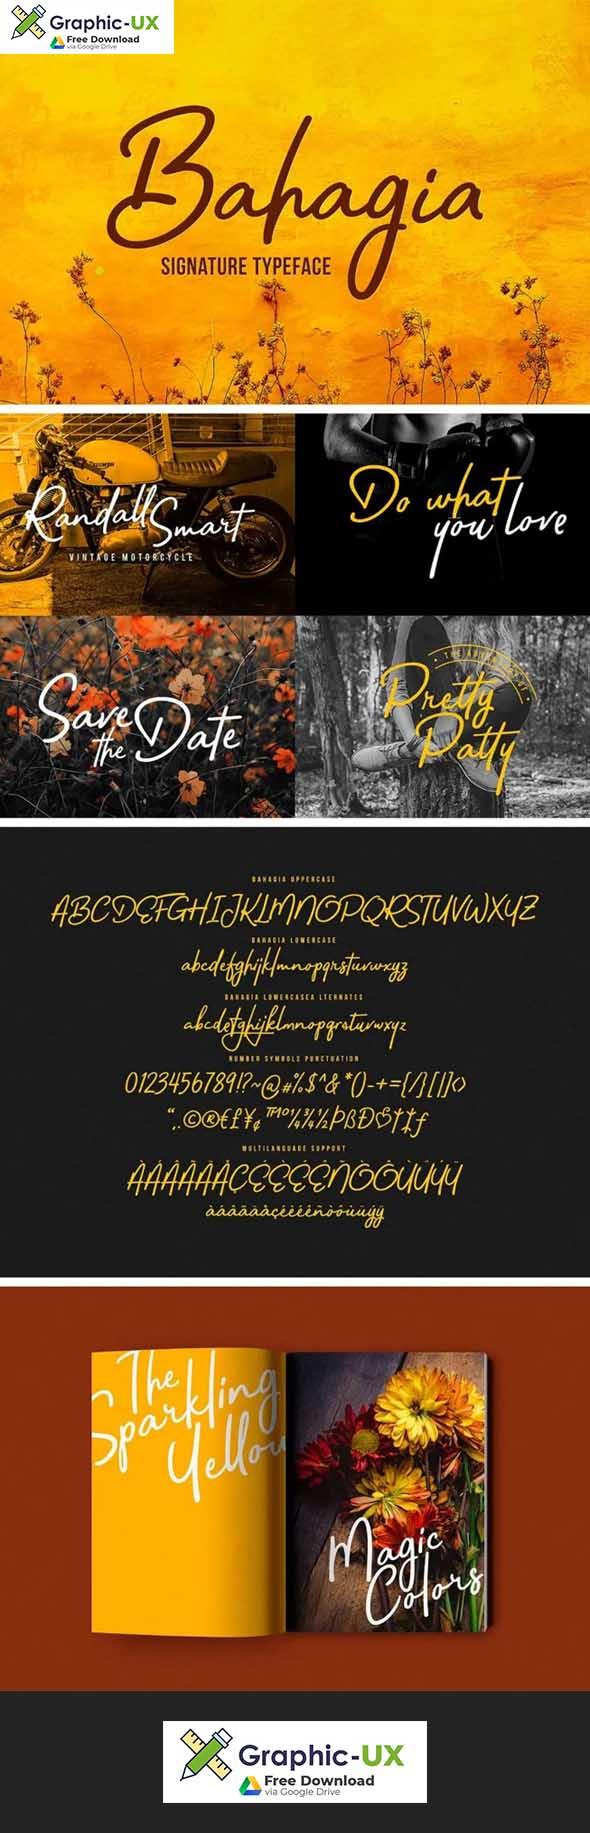 Bahagia Typeface font